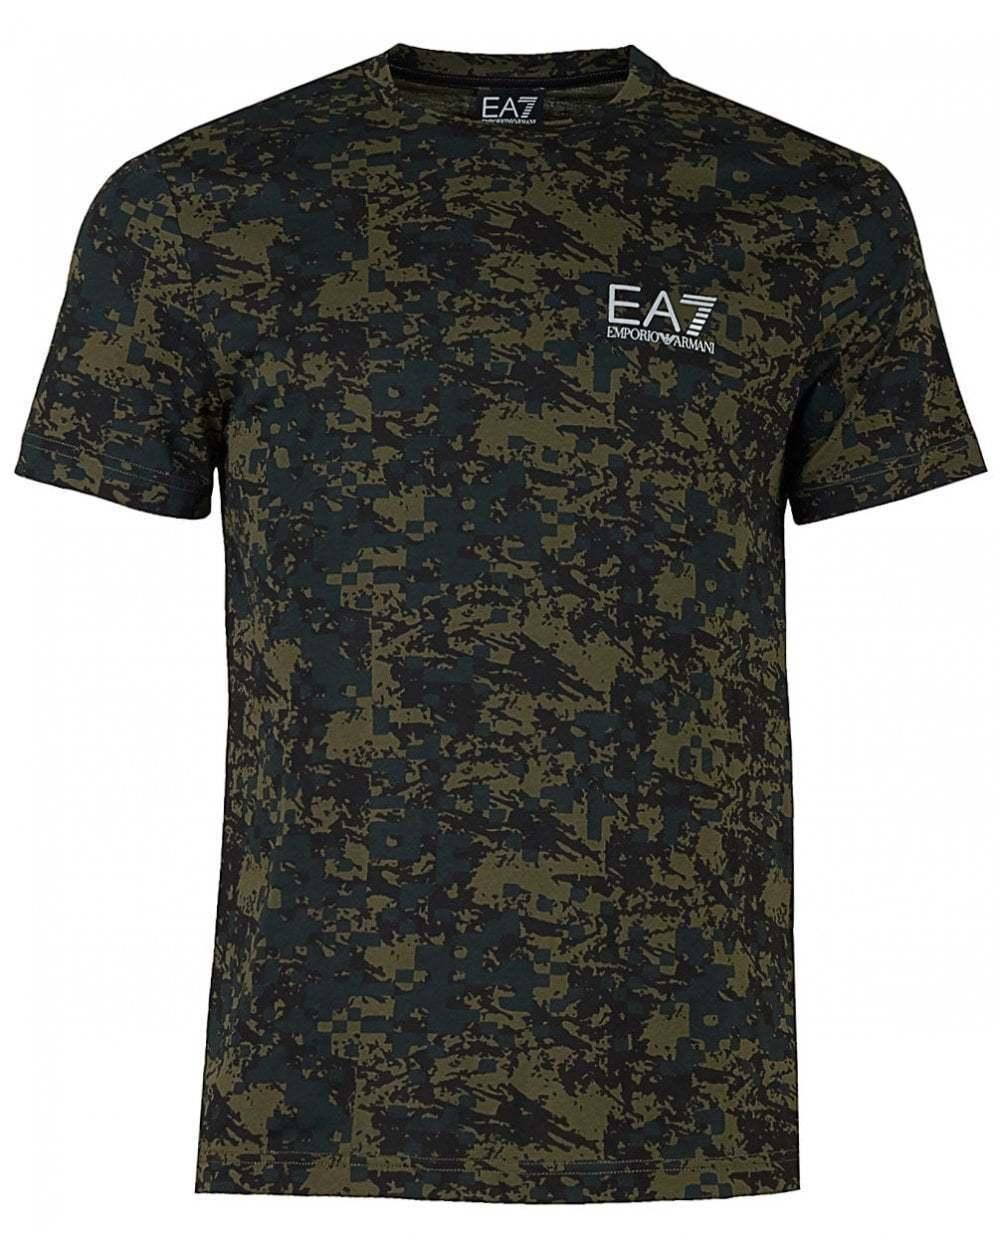 Hombre Hombre Hombre gris Ea7 tren Gráfico Pima todo camuflaje T-Shirt 319478